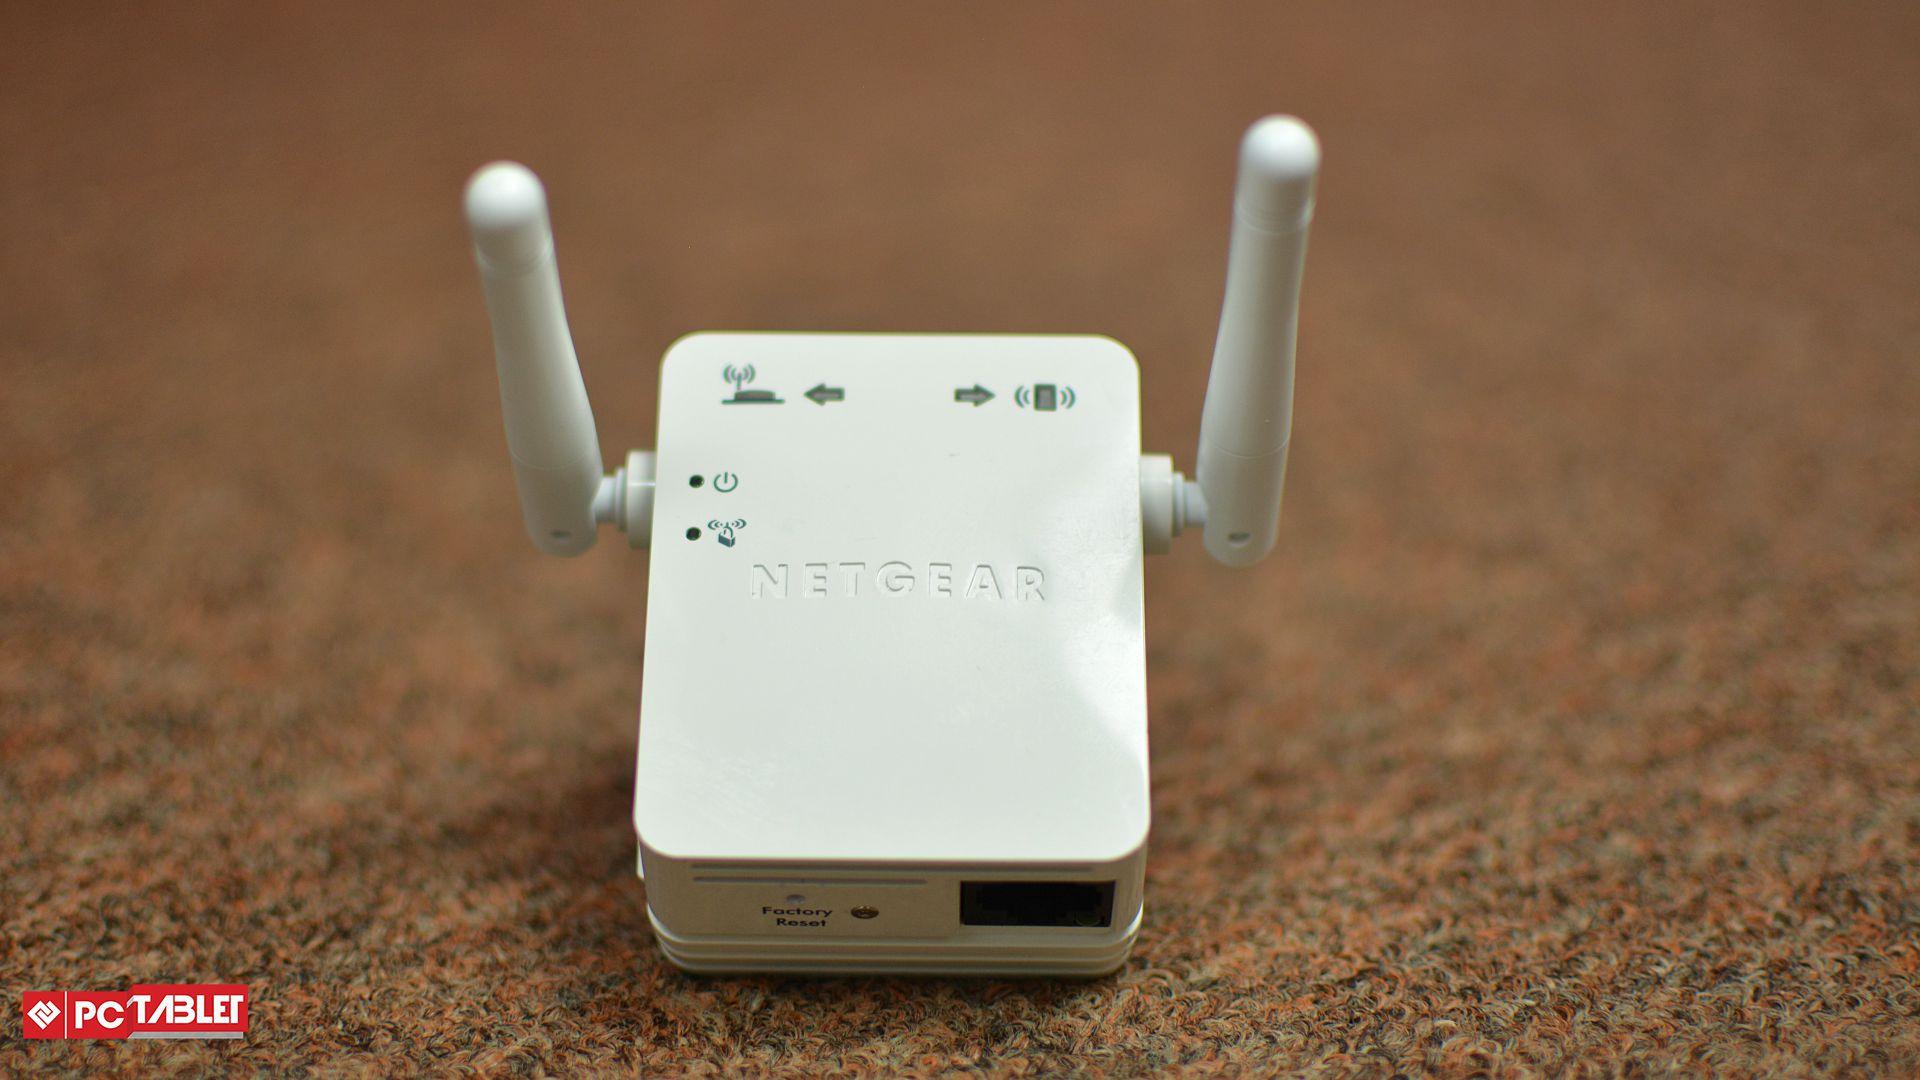 Netgear WN3000RP Wi-Fi Range Extender (1)